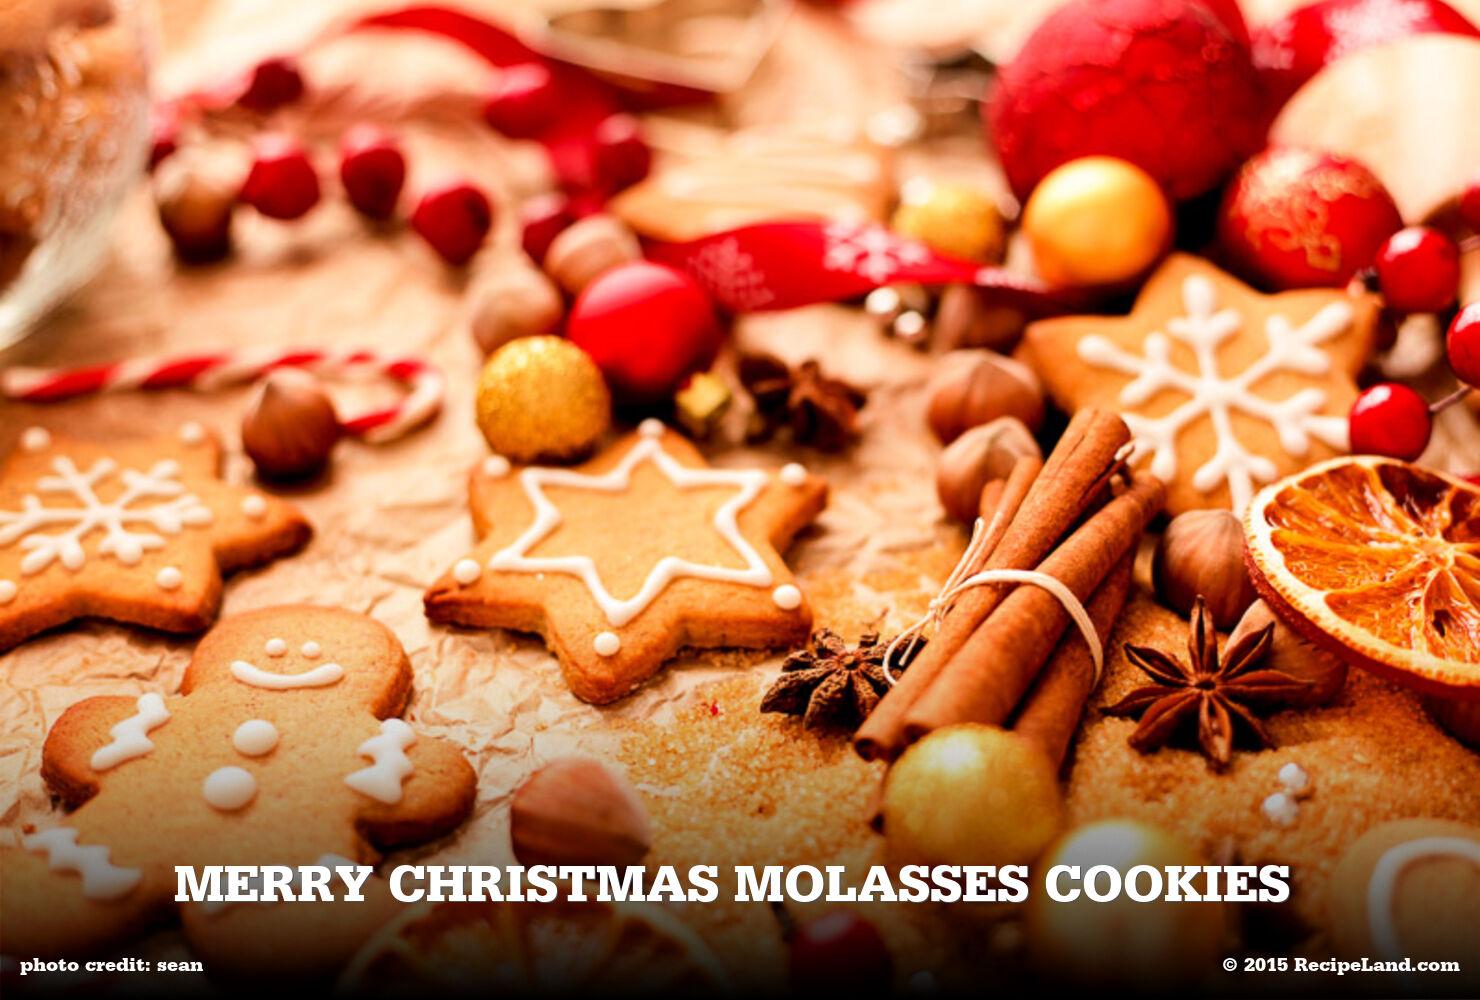 Merry Christmas Molasses Cookies